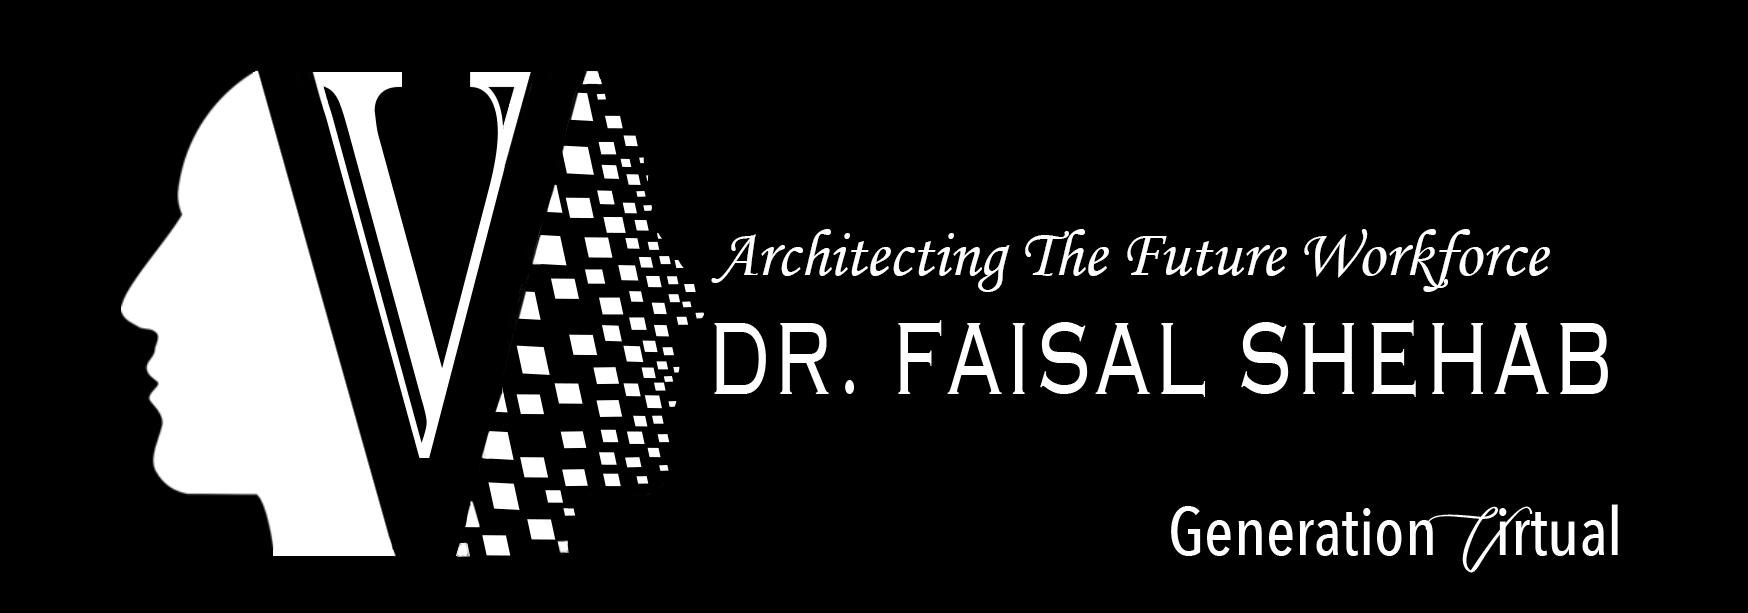 Dr. Faisal Shehab